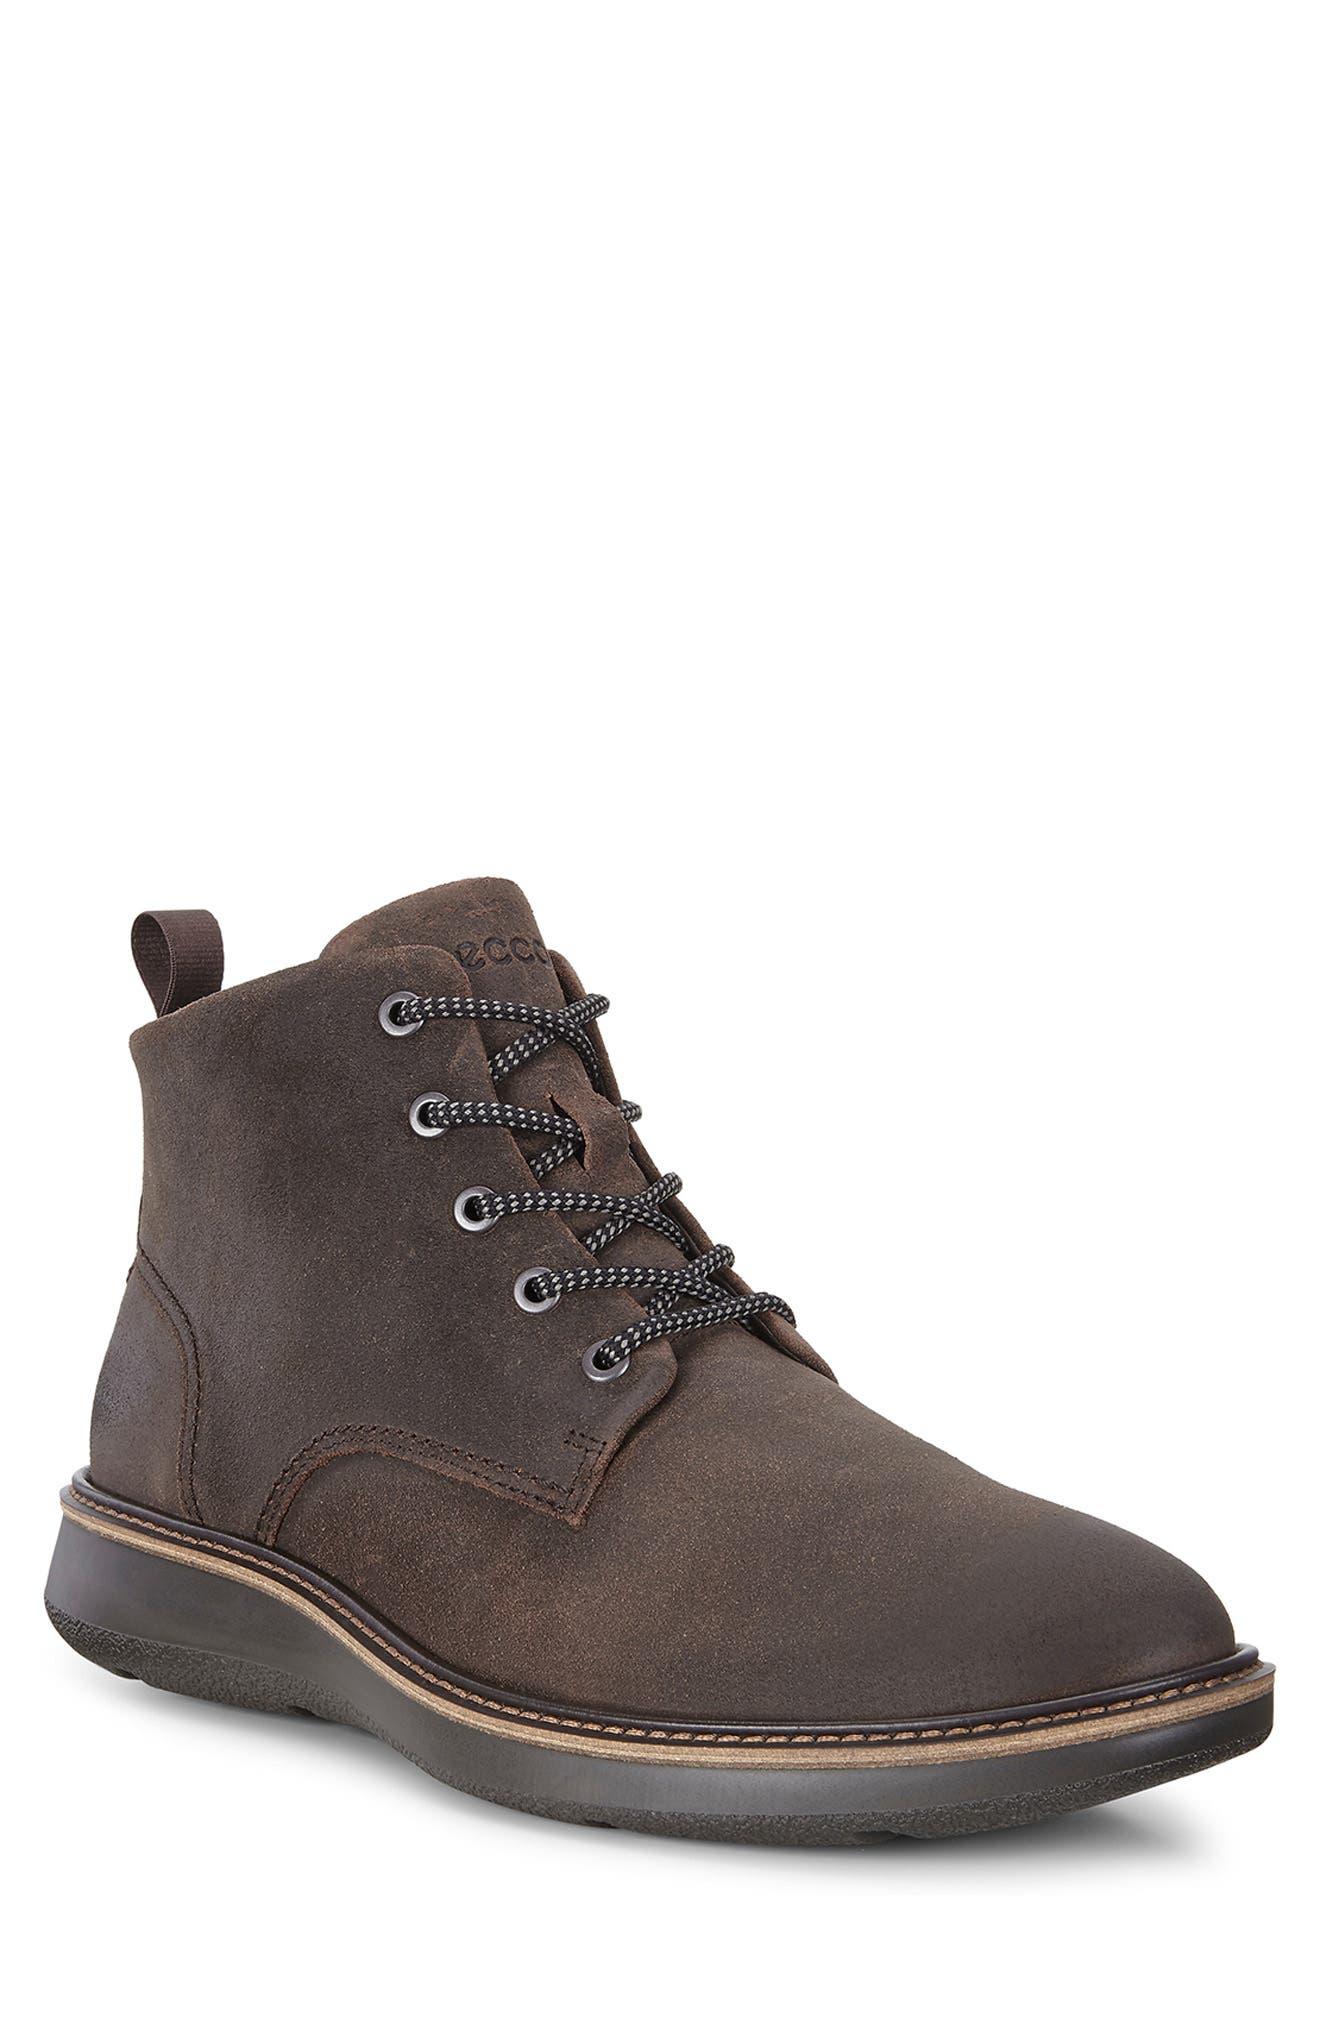 Aurora Plain Toe Boot,                         Main,                         color, COFFEE SUEDE